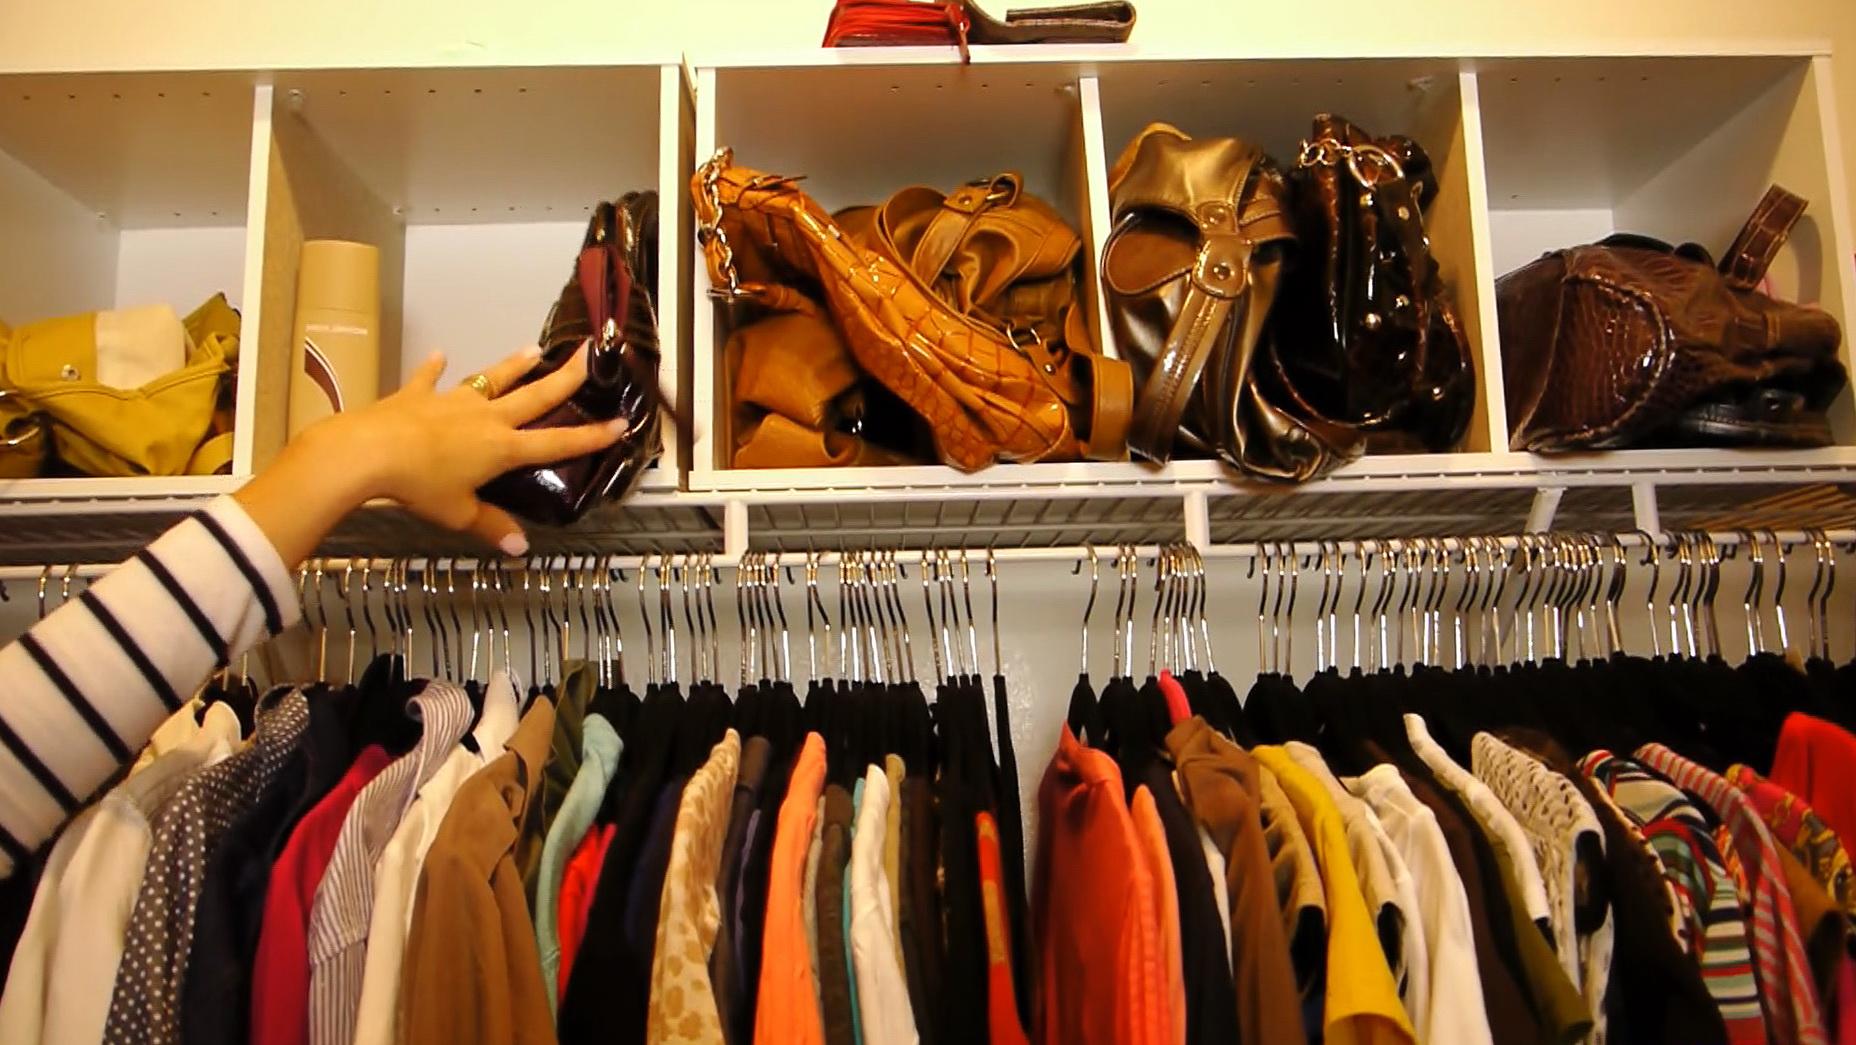 Organize Purses In Your Closet